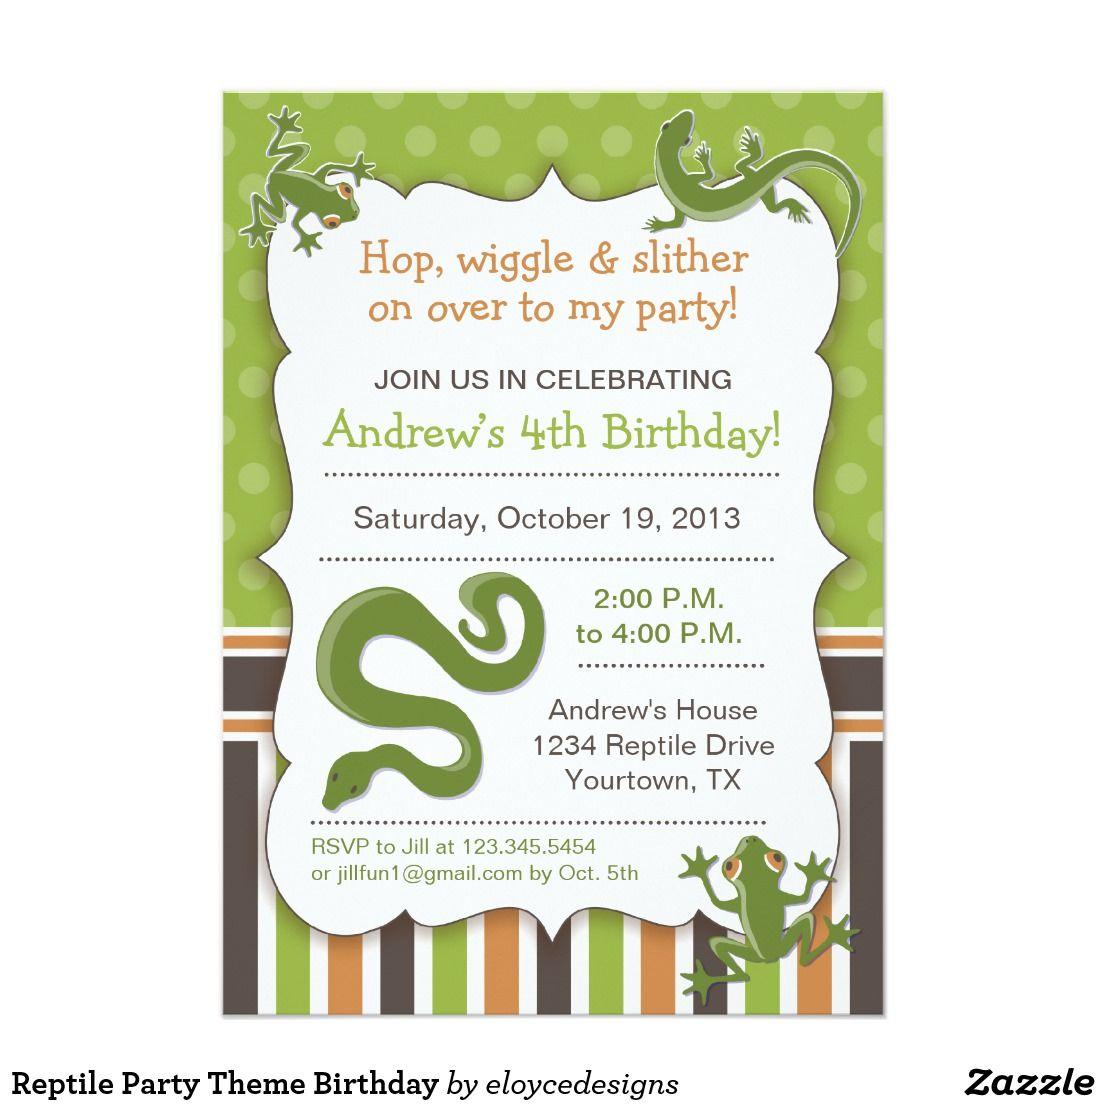 Reptile Party Theme Birthday Invitation | Pinterest | Reptile party ...